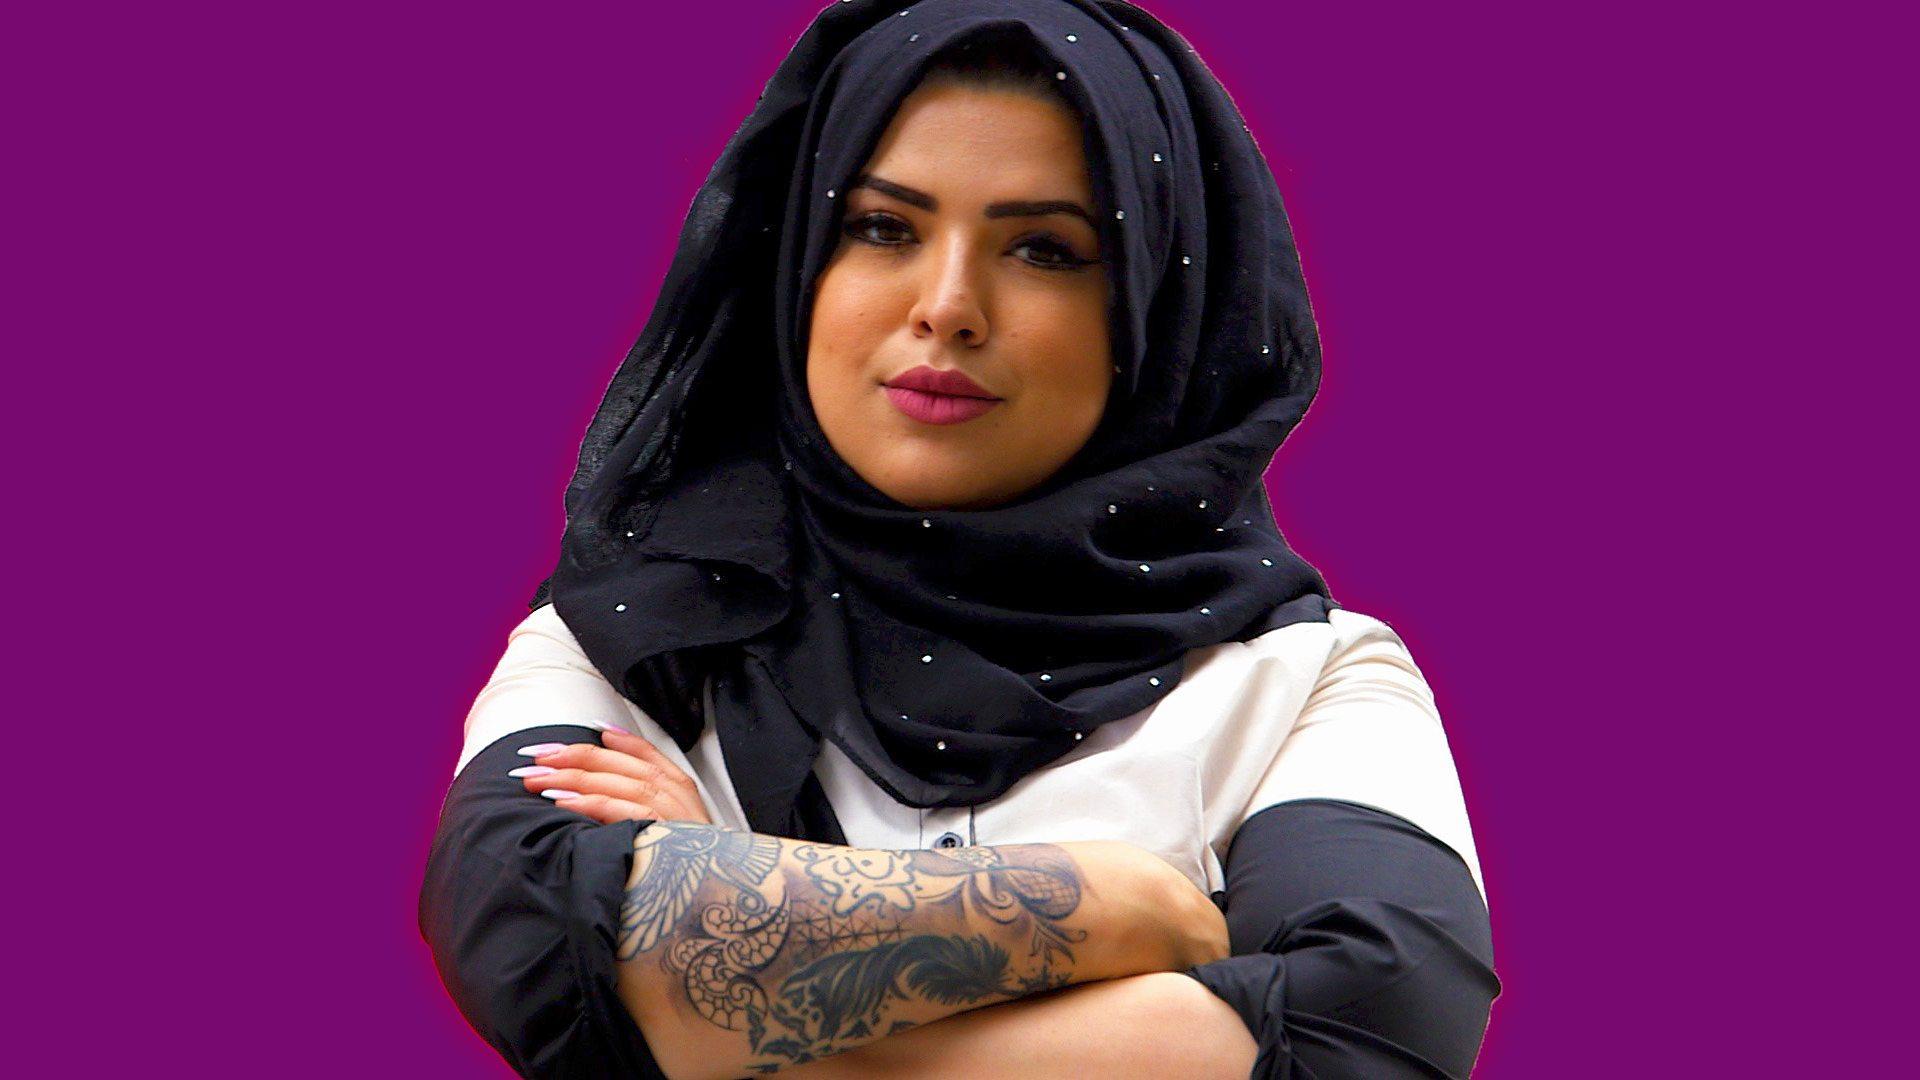 Speed dating london muslim dating violence pdf